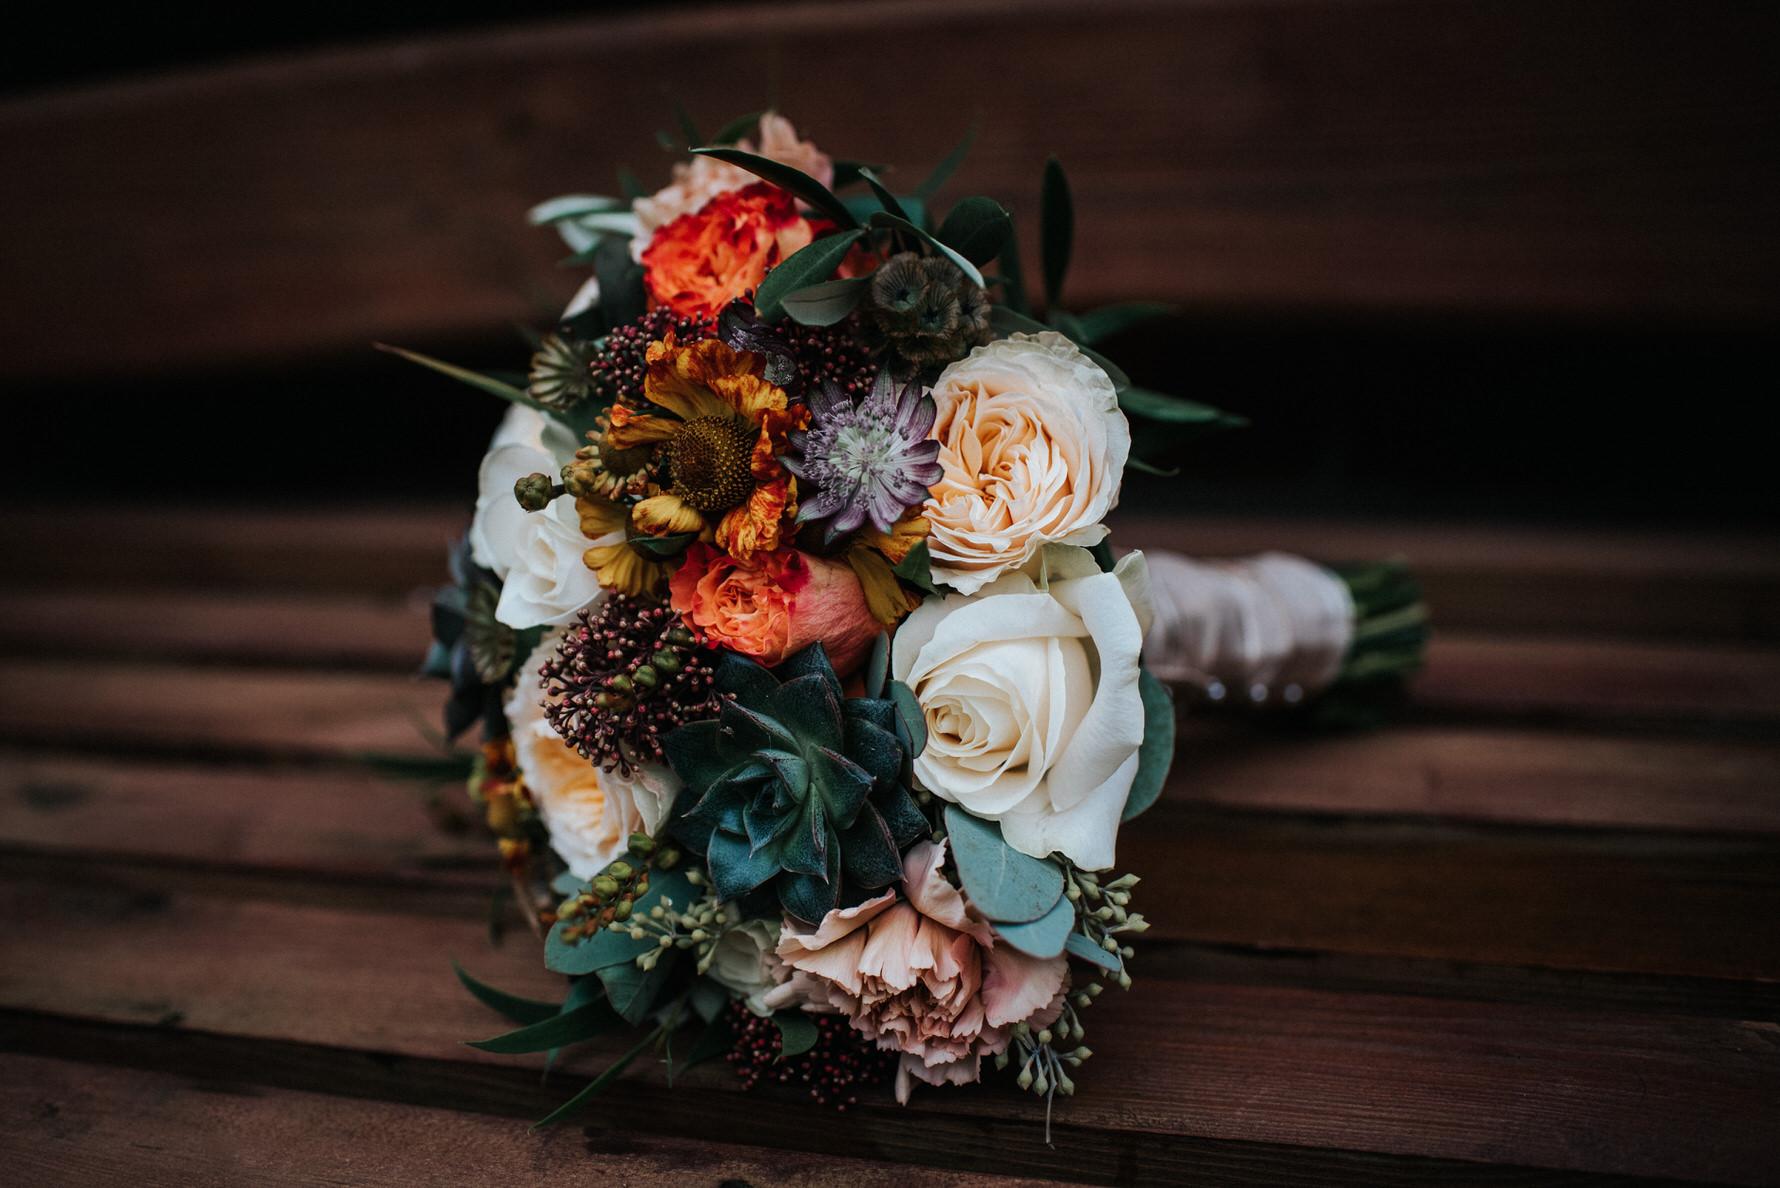 Cheshire Unposed Documentary Wedding Photography at Colshaw Hall